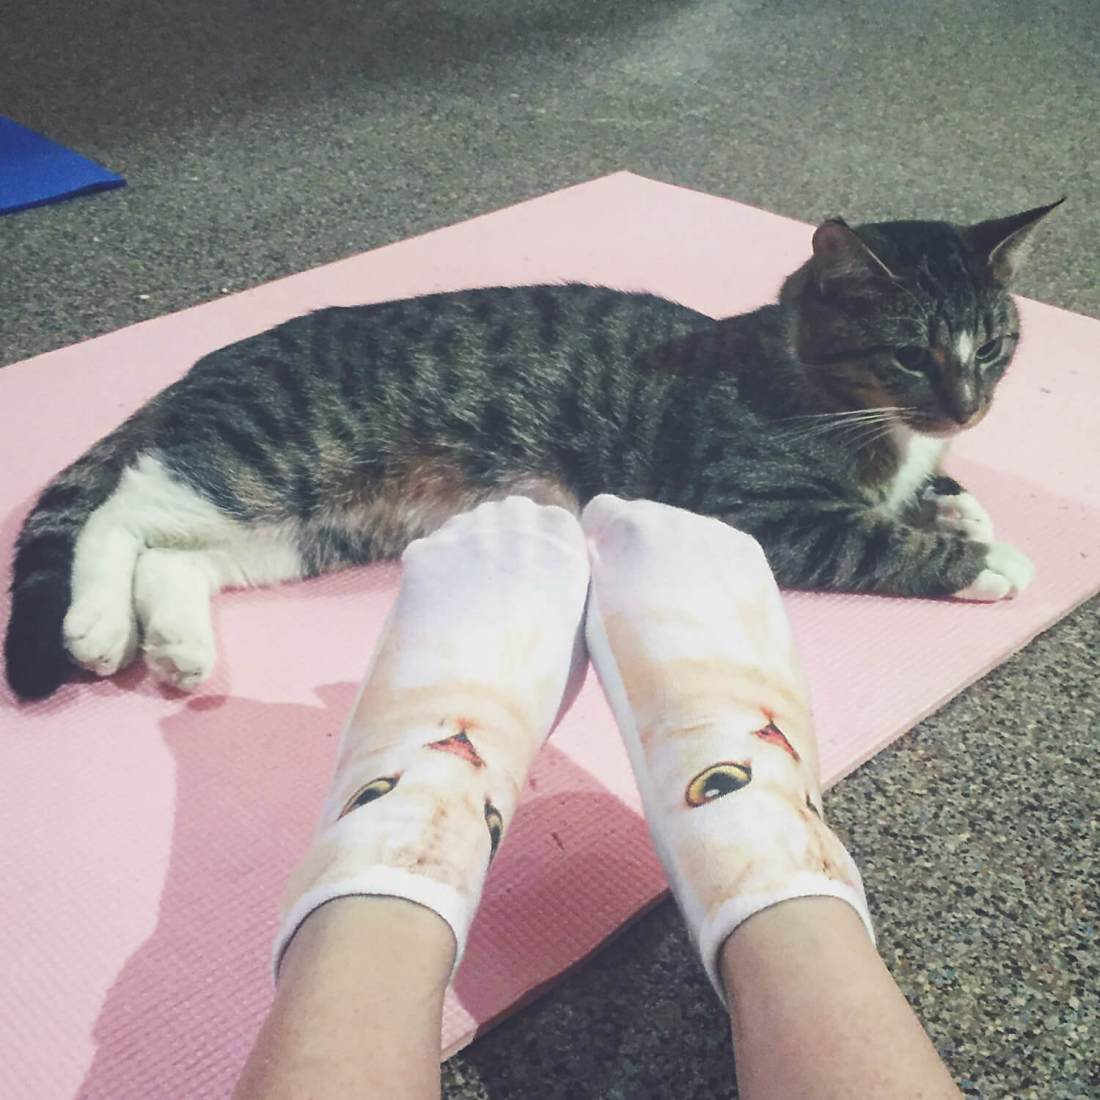 Cats on Your Mats - Cat Yoga - Edmonton Humane Society